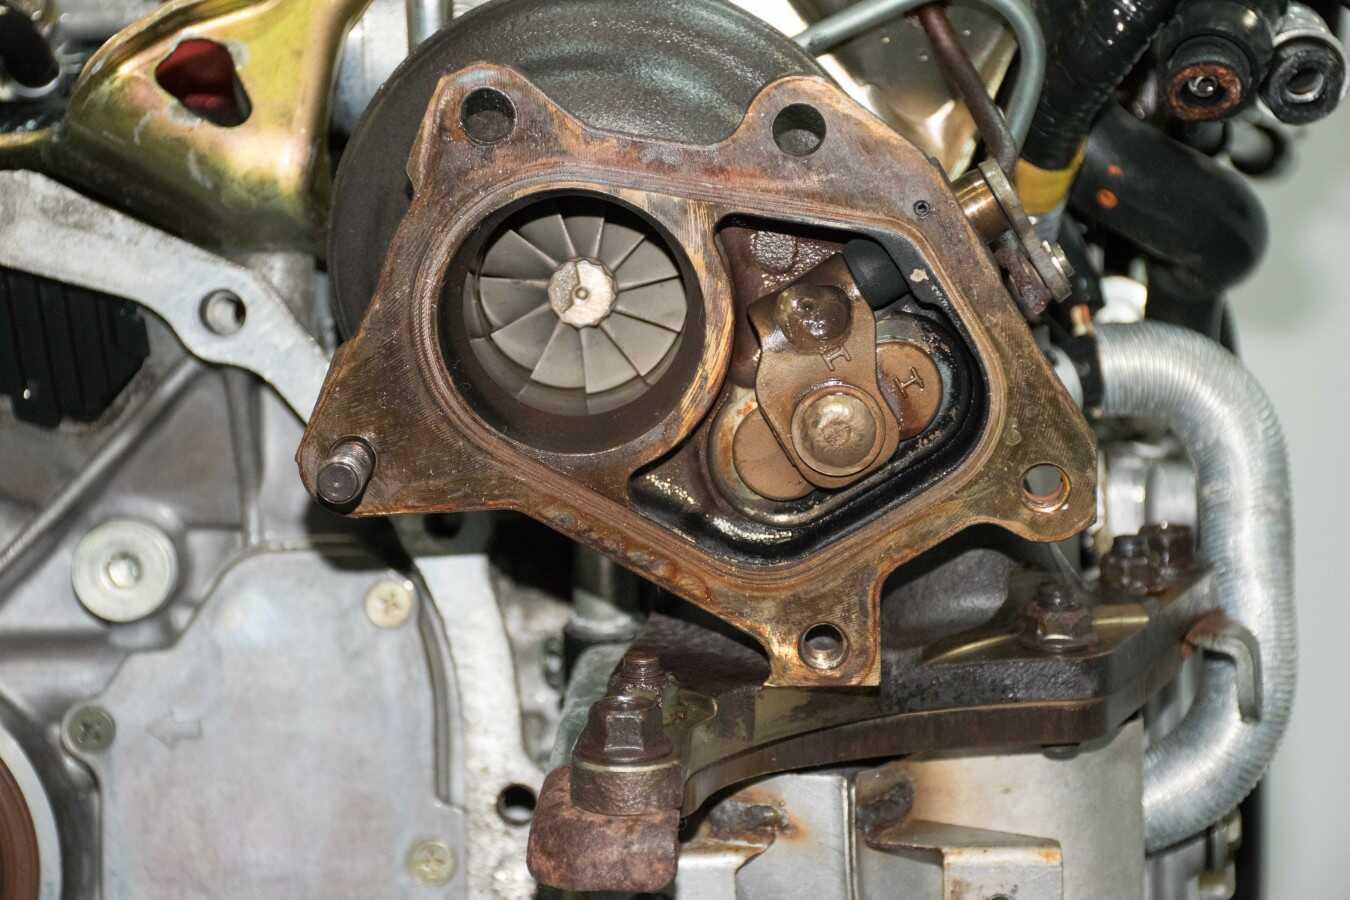 Low Mileage JDM Subaru WRX STi Spec C EJ207 Engine with Twin Scroll Ball  Bearing VF36 Turbo, Downpipe Intercooler ECU Wiring